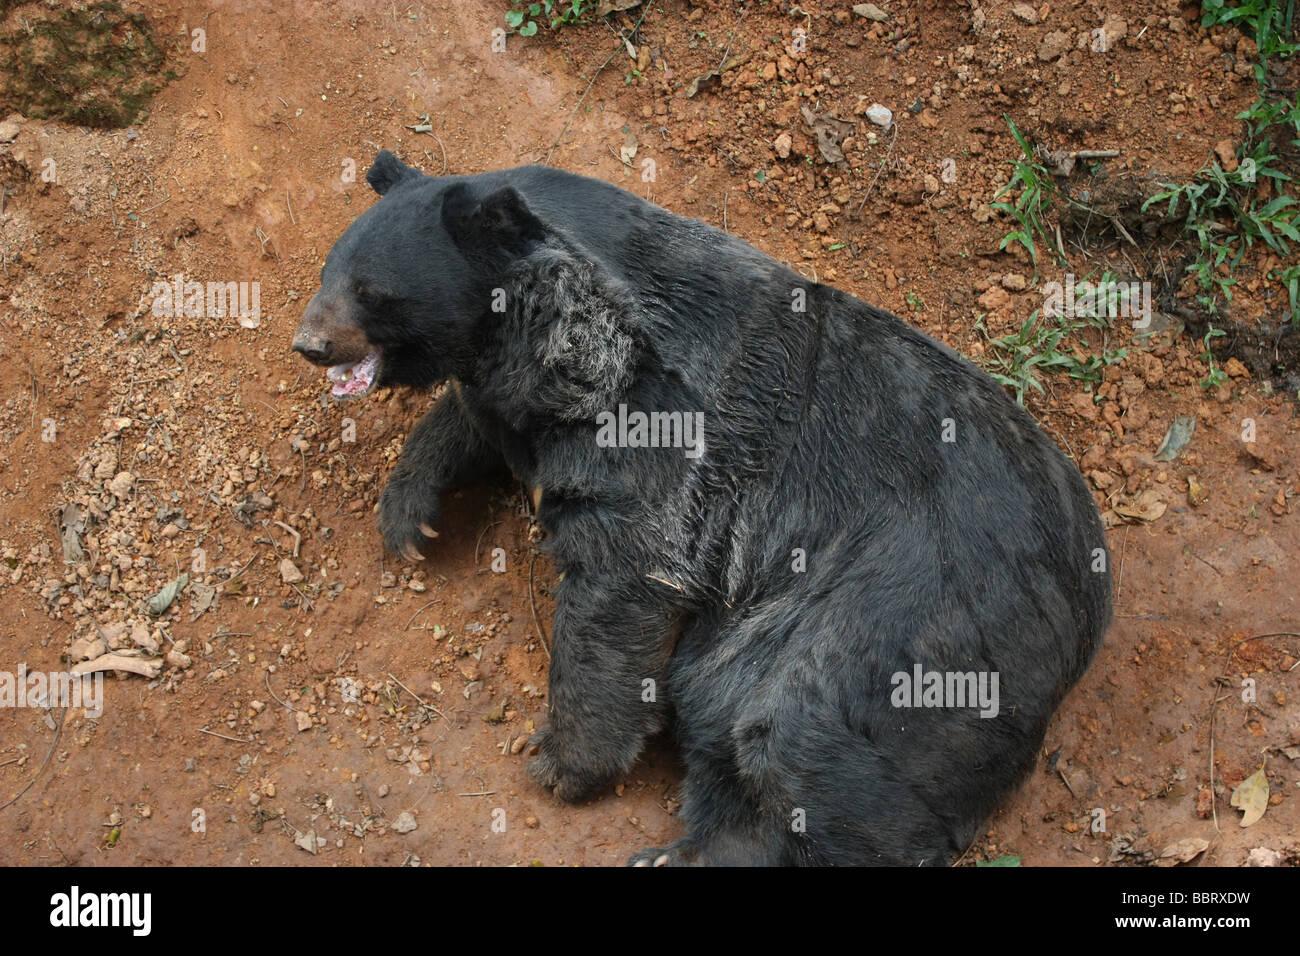 Asian Black Bear - Stock Image